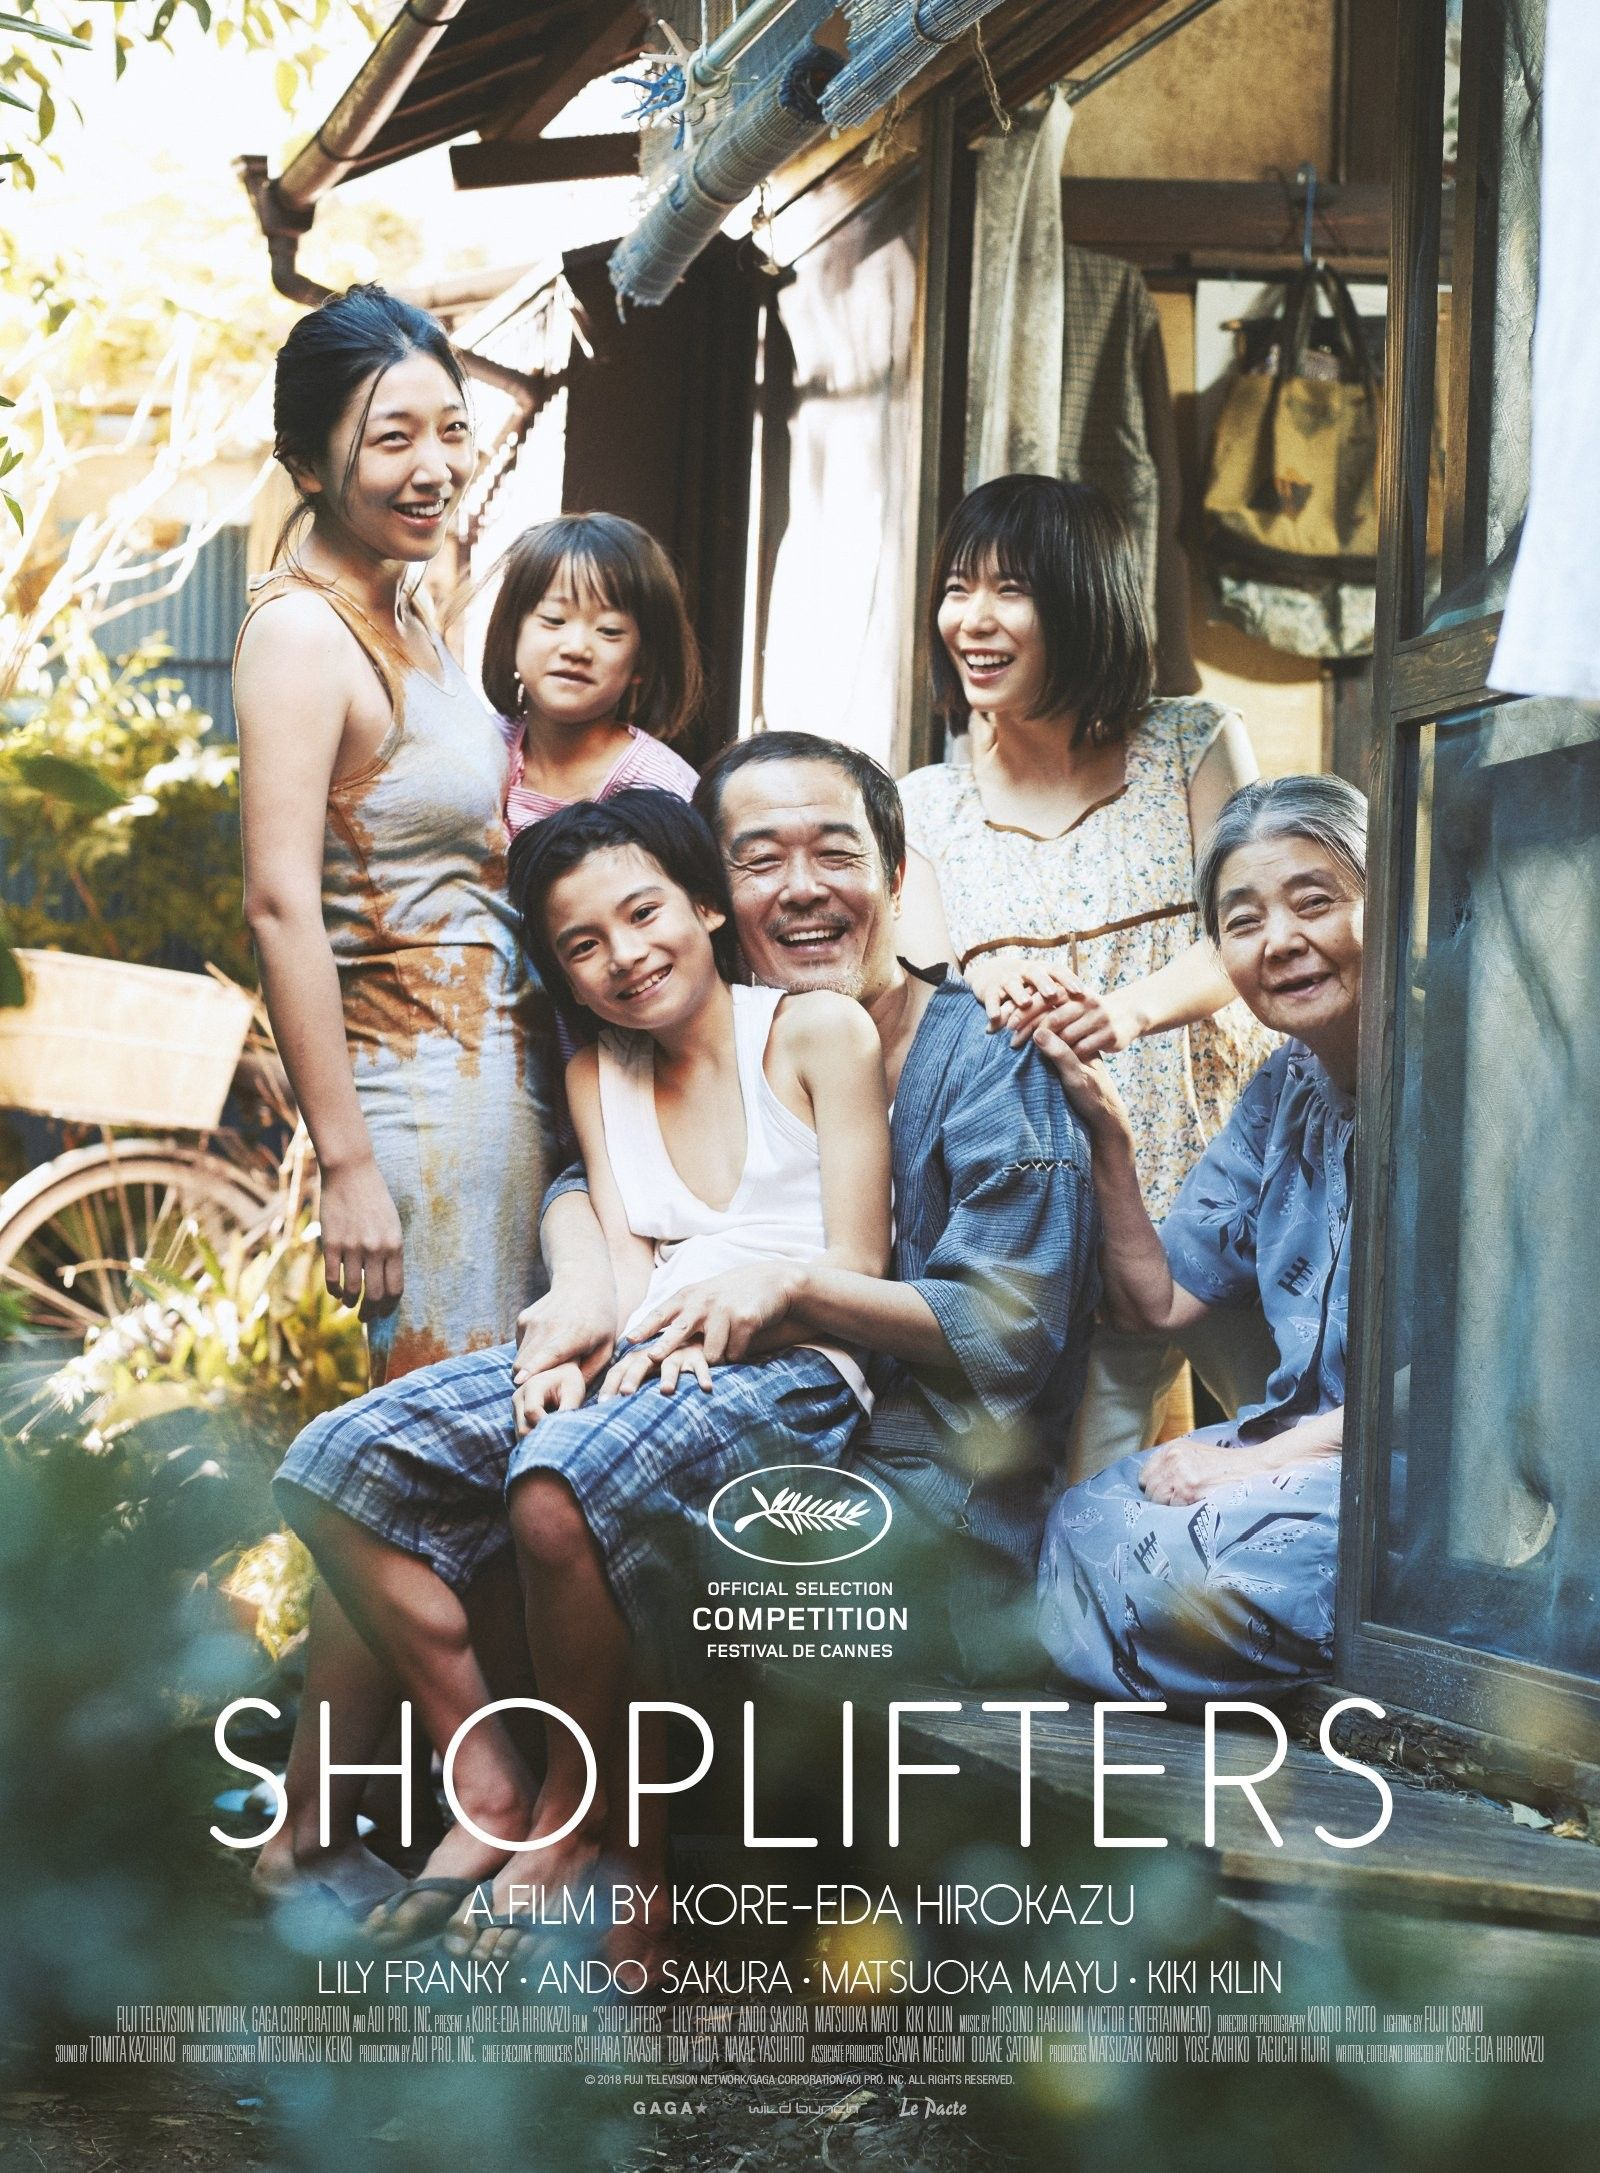 Shoplifters Reviews Assuntos de família